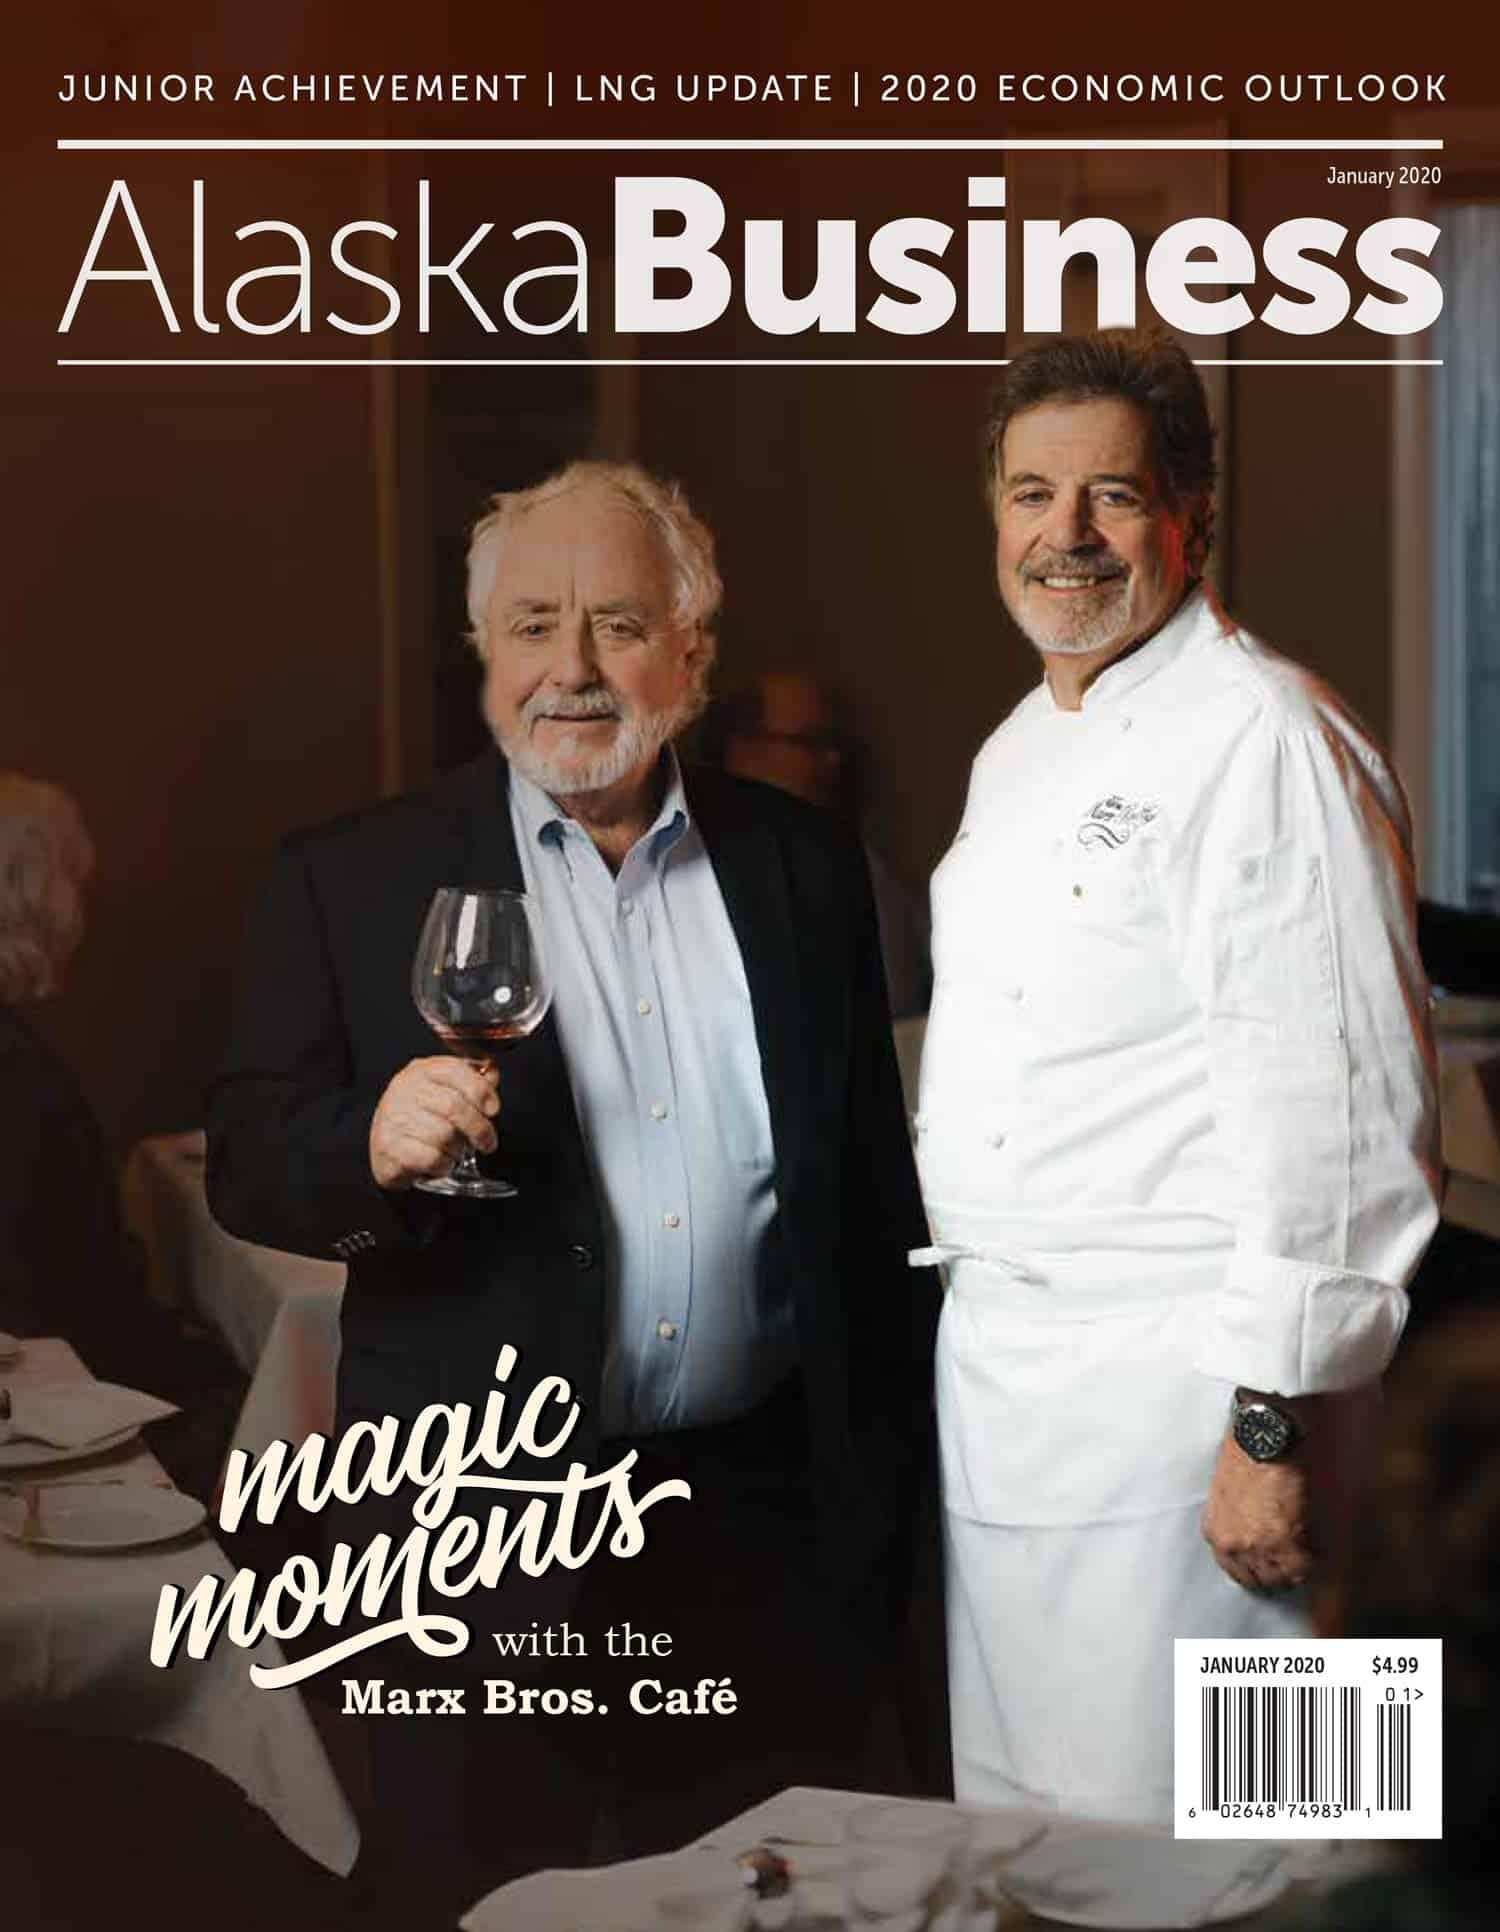 Alaska Business January 2020 cover